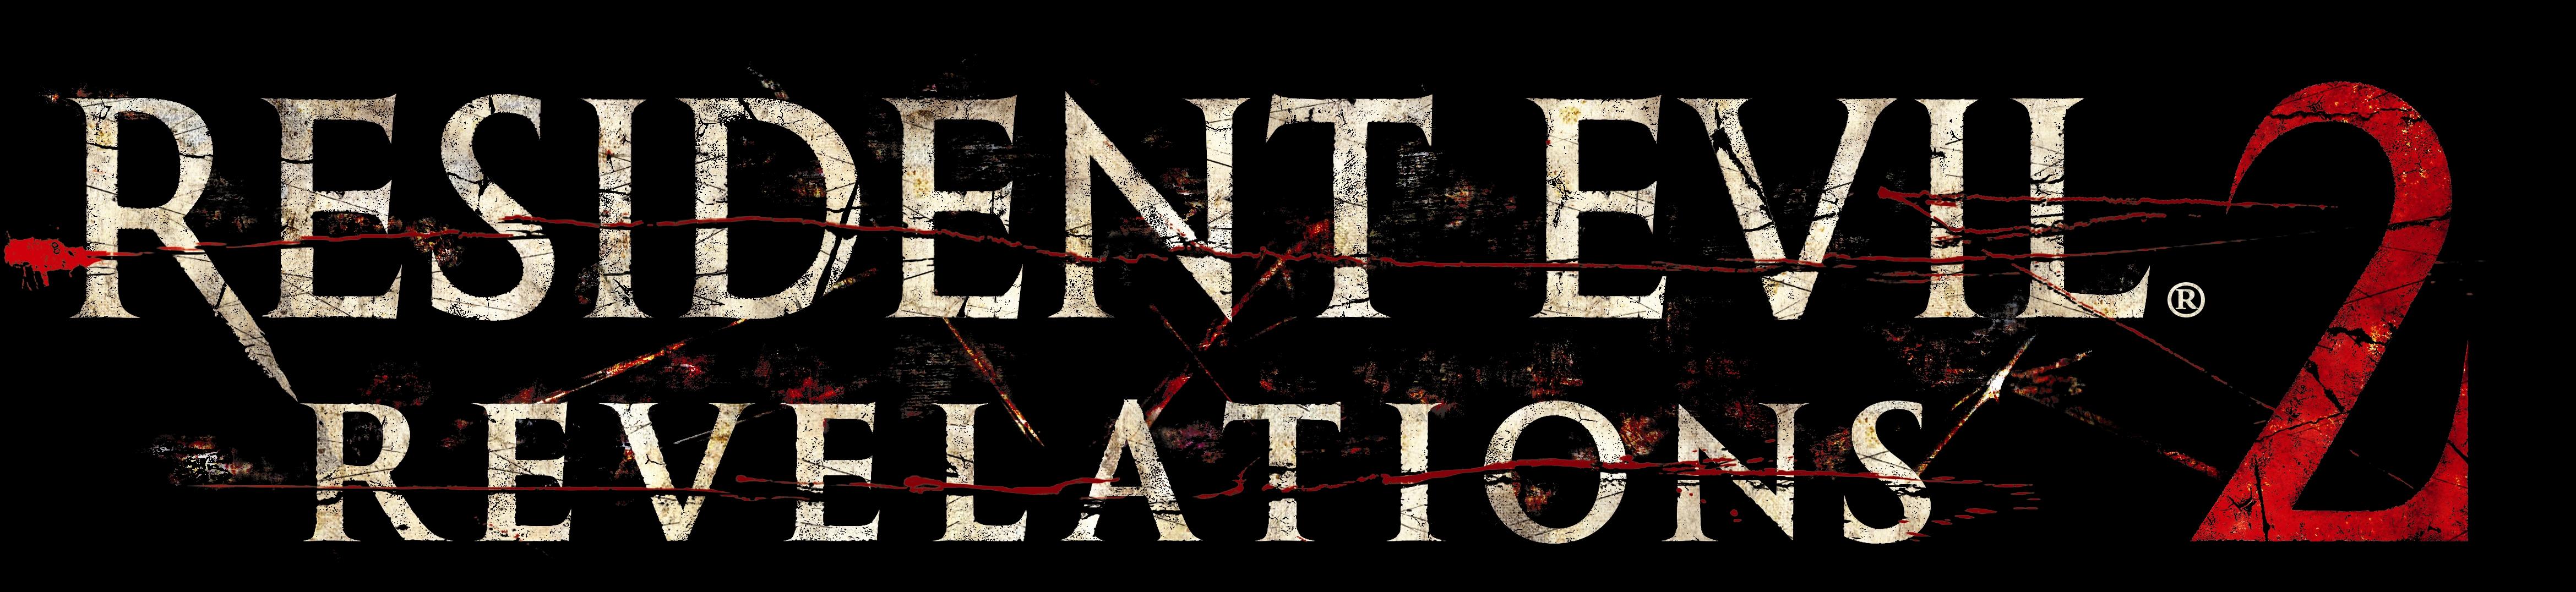 Playstation 4 News: Resident Evil Revelations 2, New ...